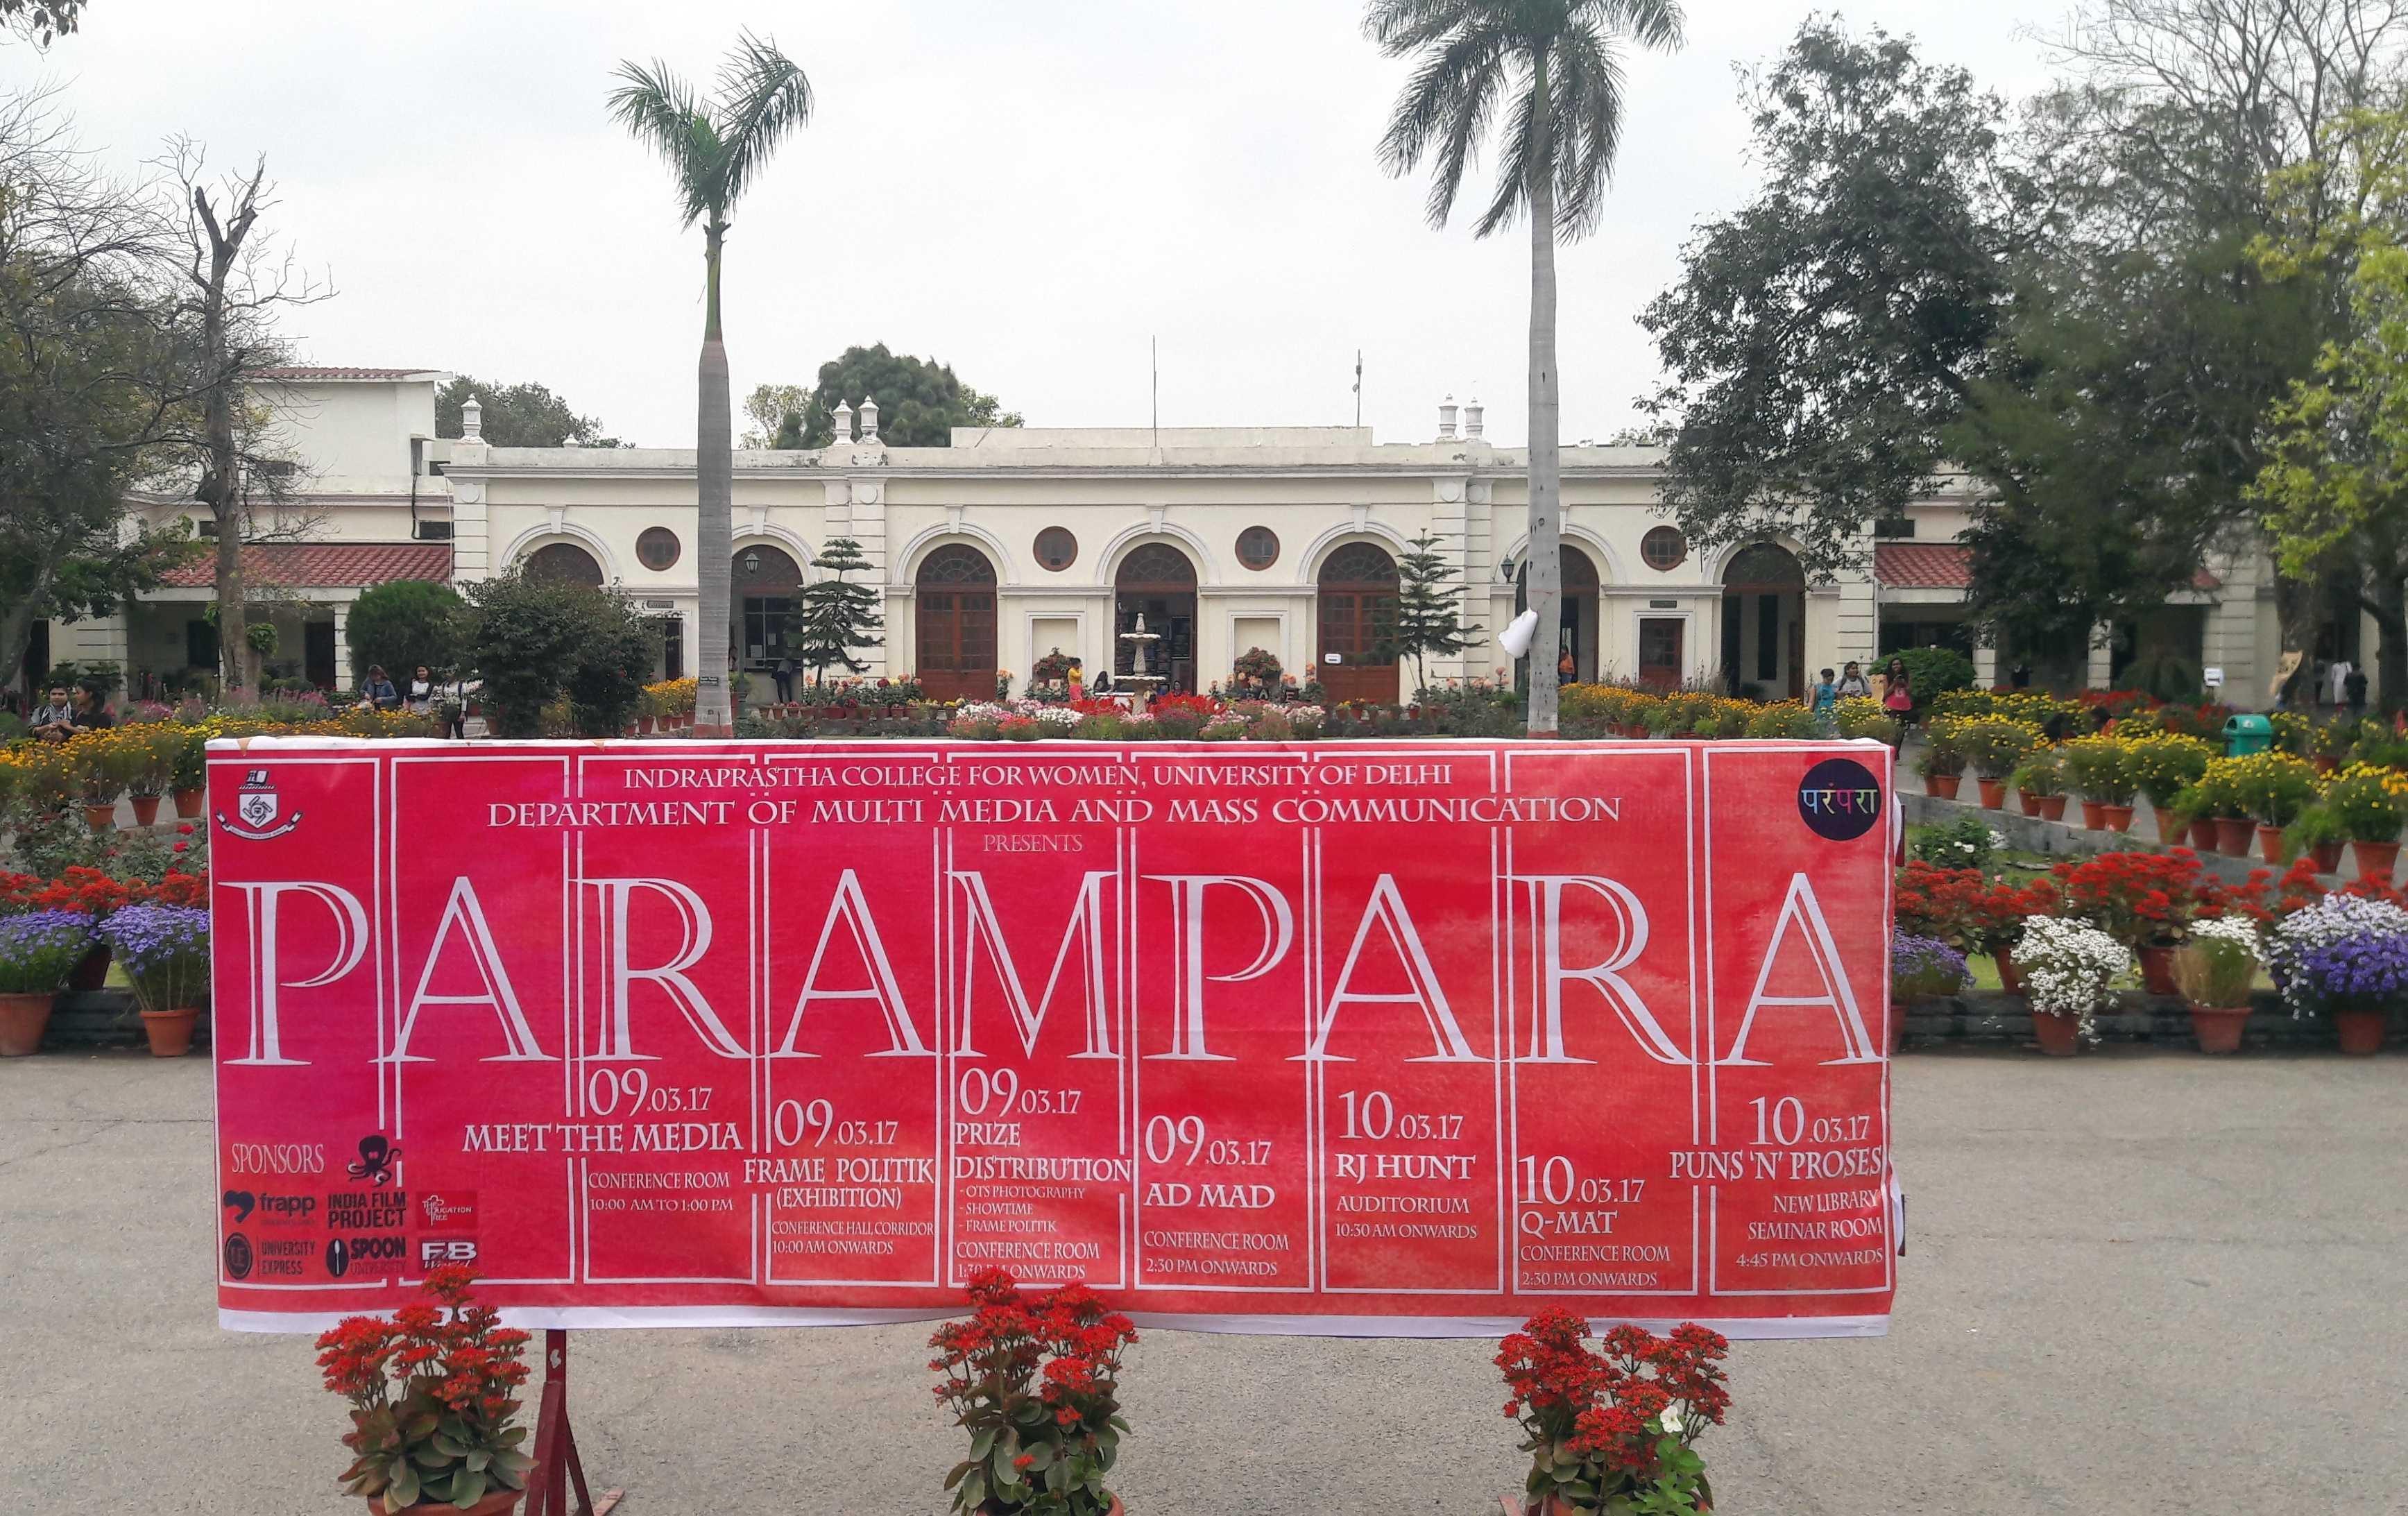 Parampara fest-IP College-fnbworld-photo by Ridhi Chhabra